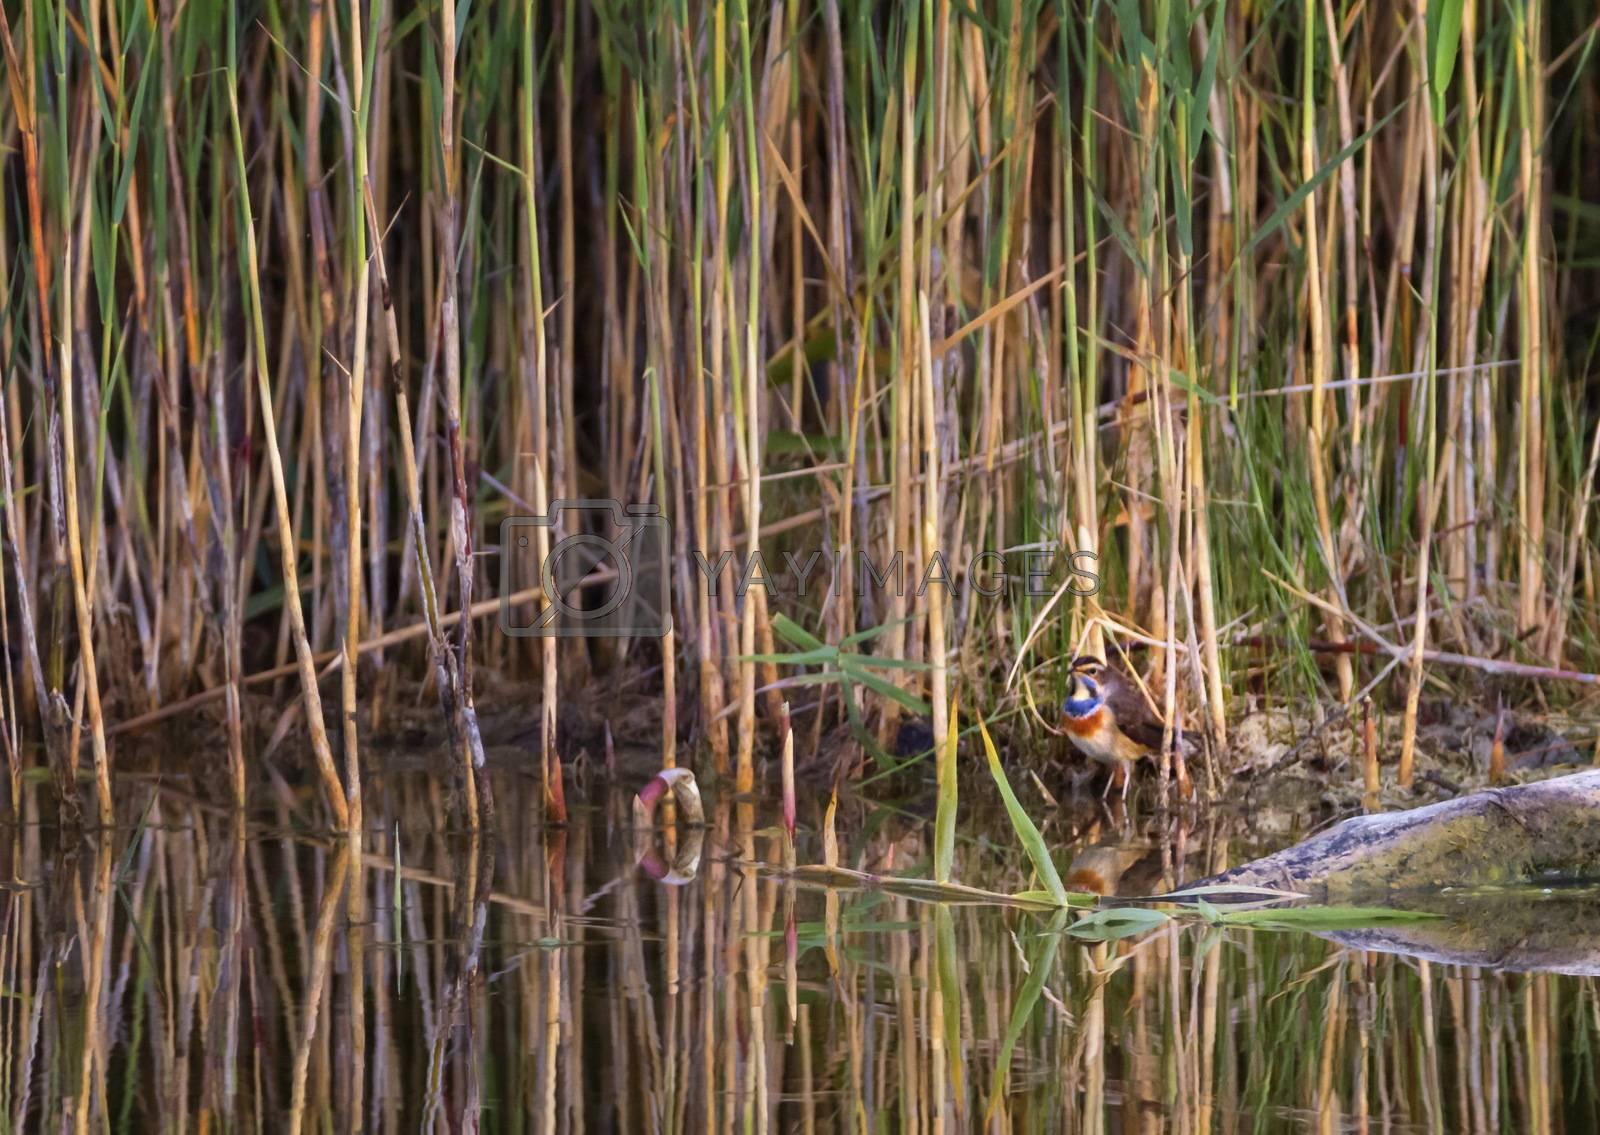 Little bluethroat, luscinia svecica, bird near a swamp, Neuchatel lake, Switzerland